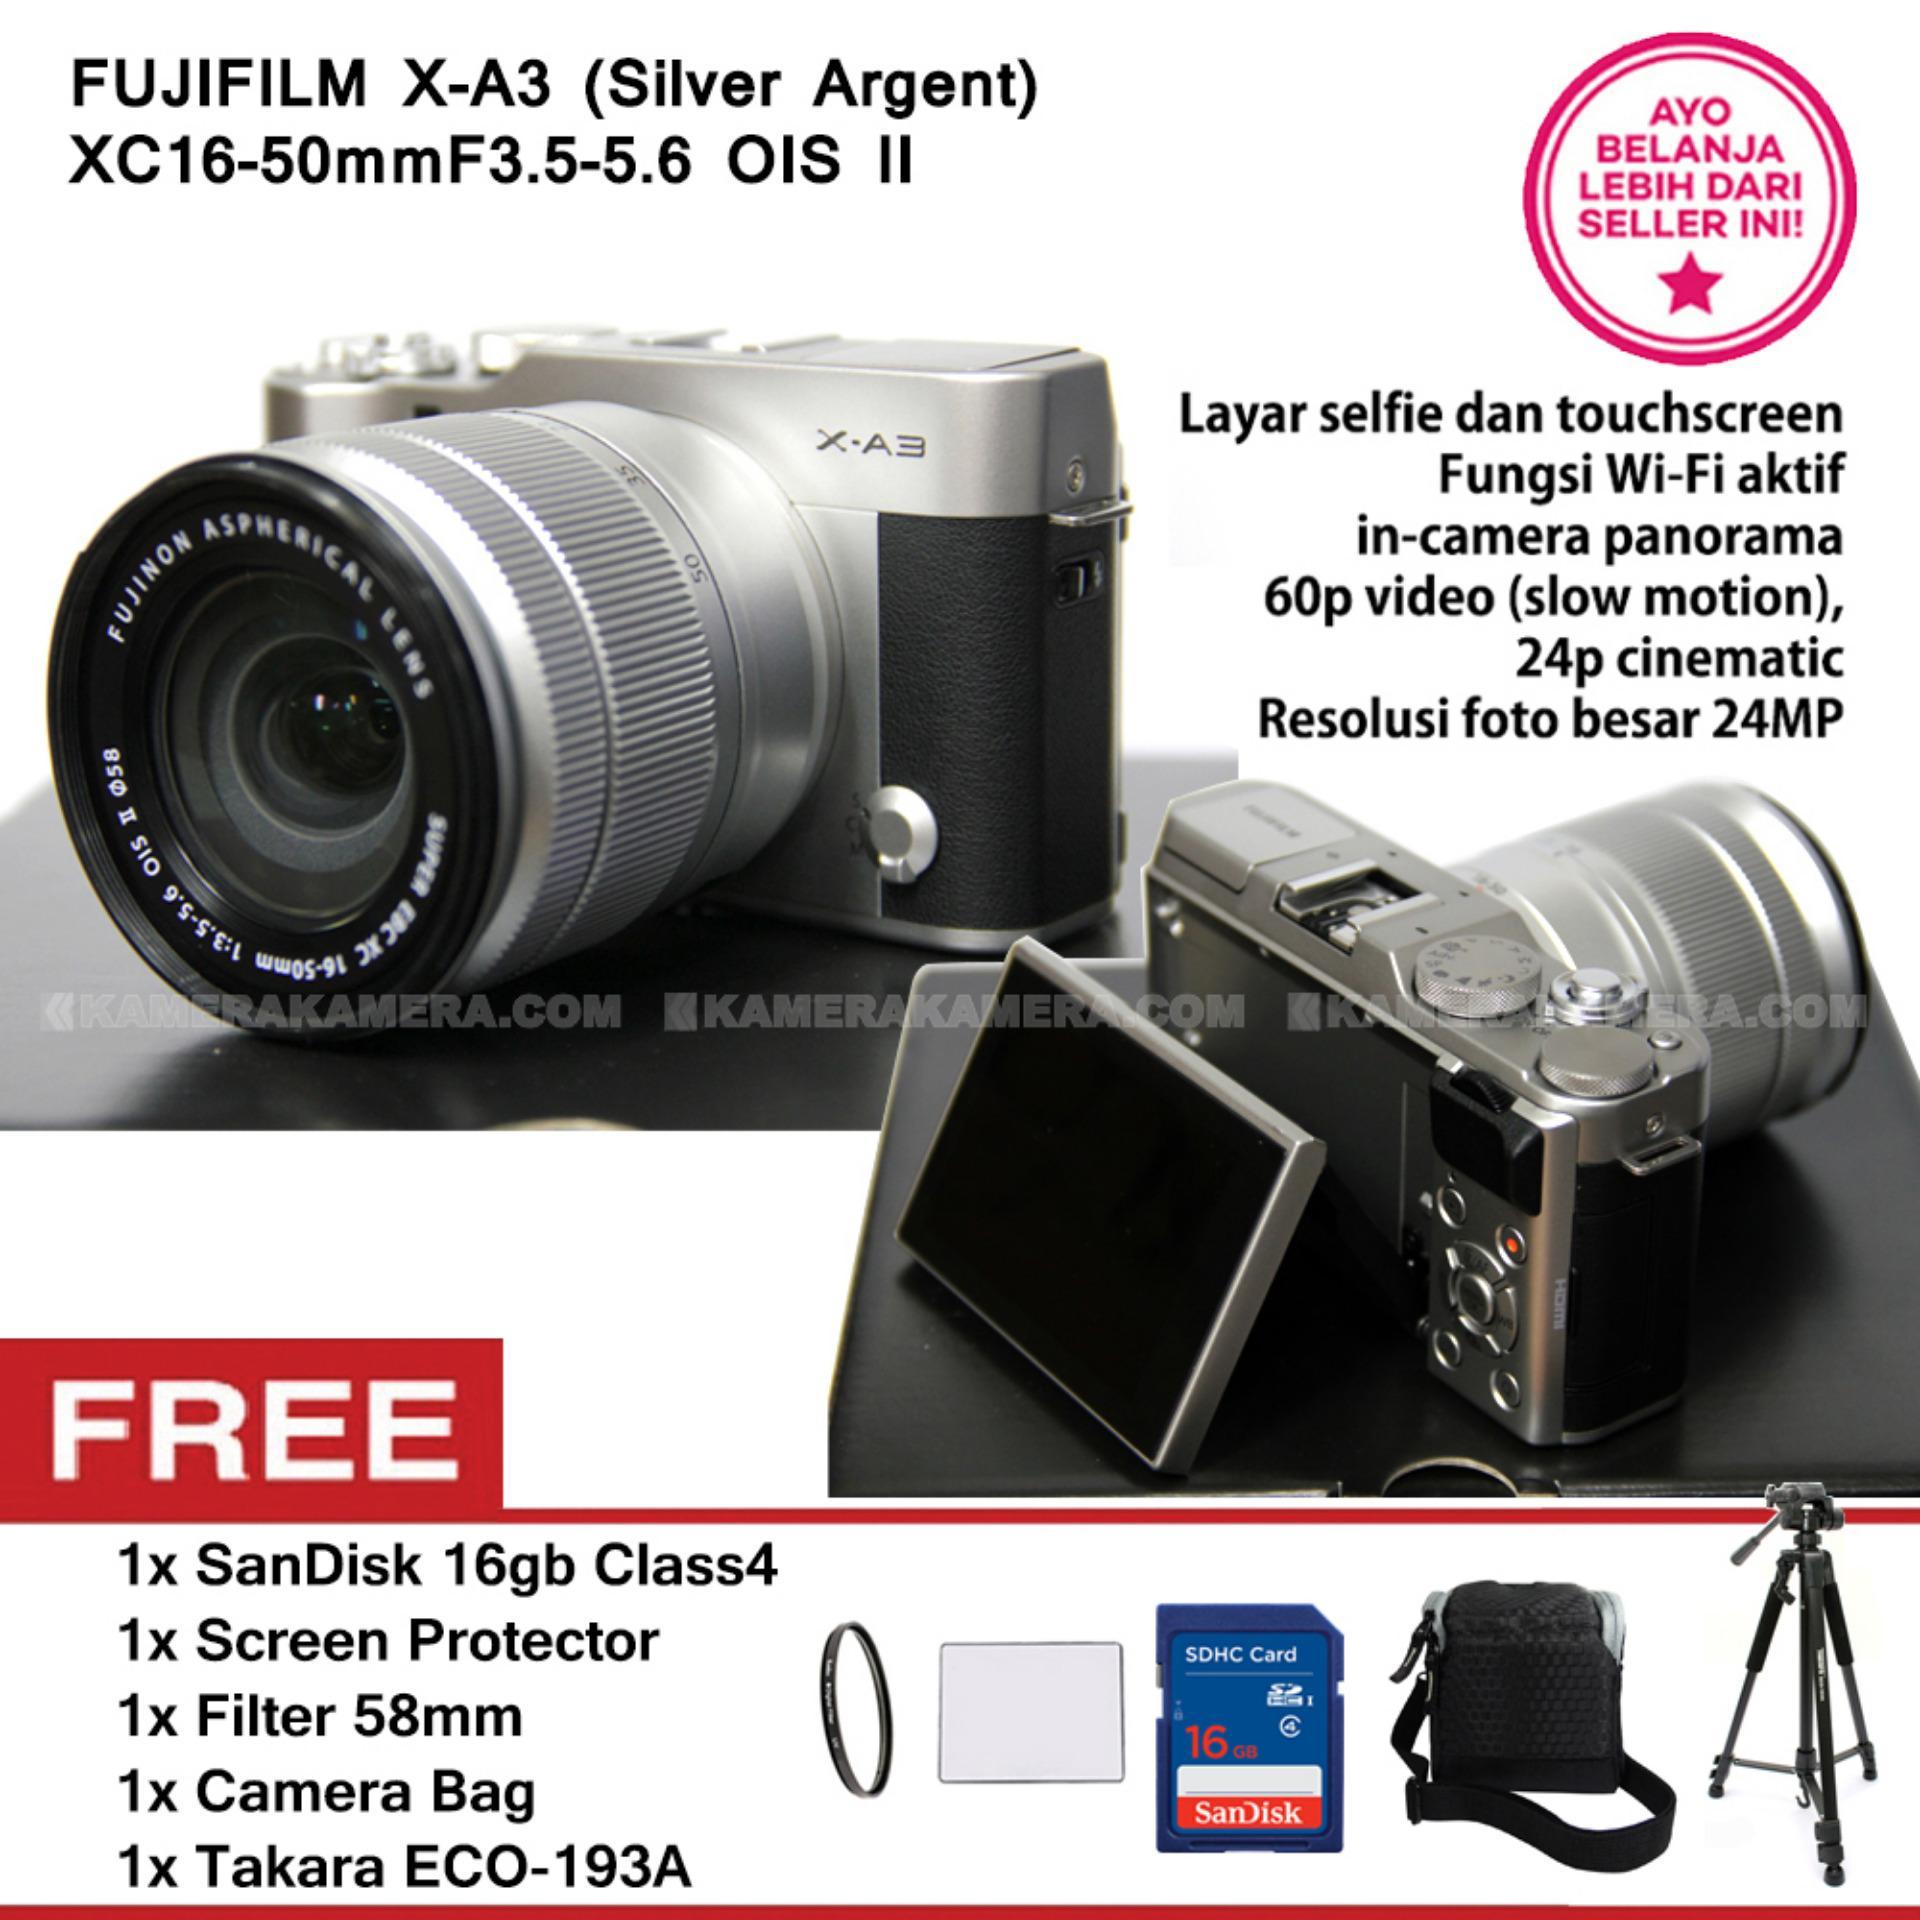 Nikon D5500 Dslr With Wi Fi 242mp Lens Kit 18 55 Vr Ii Memory Hdsc Fujifilm X A3 16 50mm F35 56 Ois Brown Pwp Xf23mm F2 Pink Rose Xc16